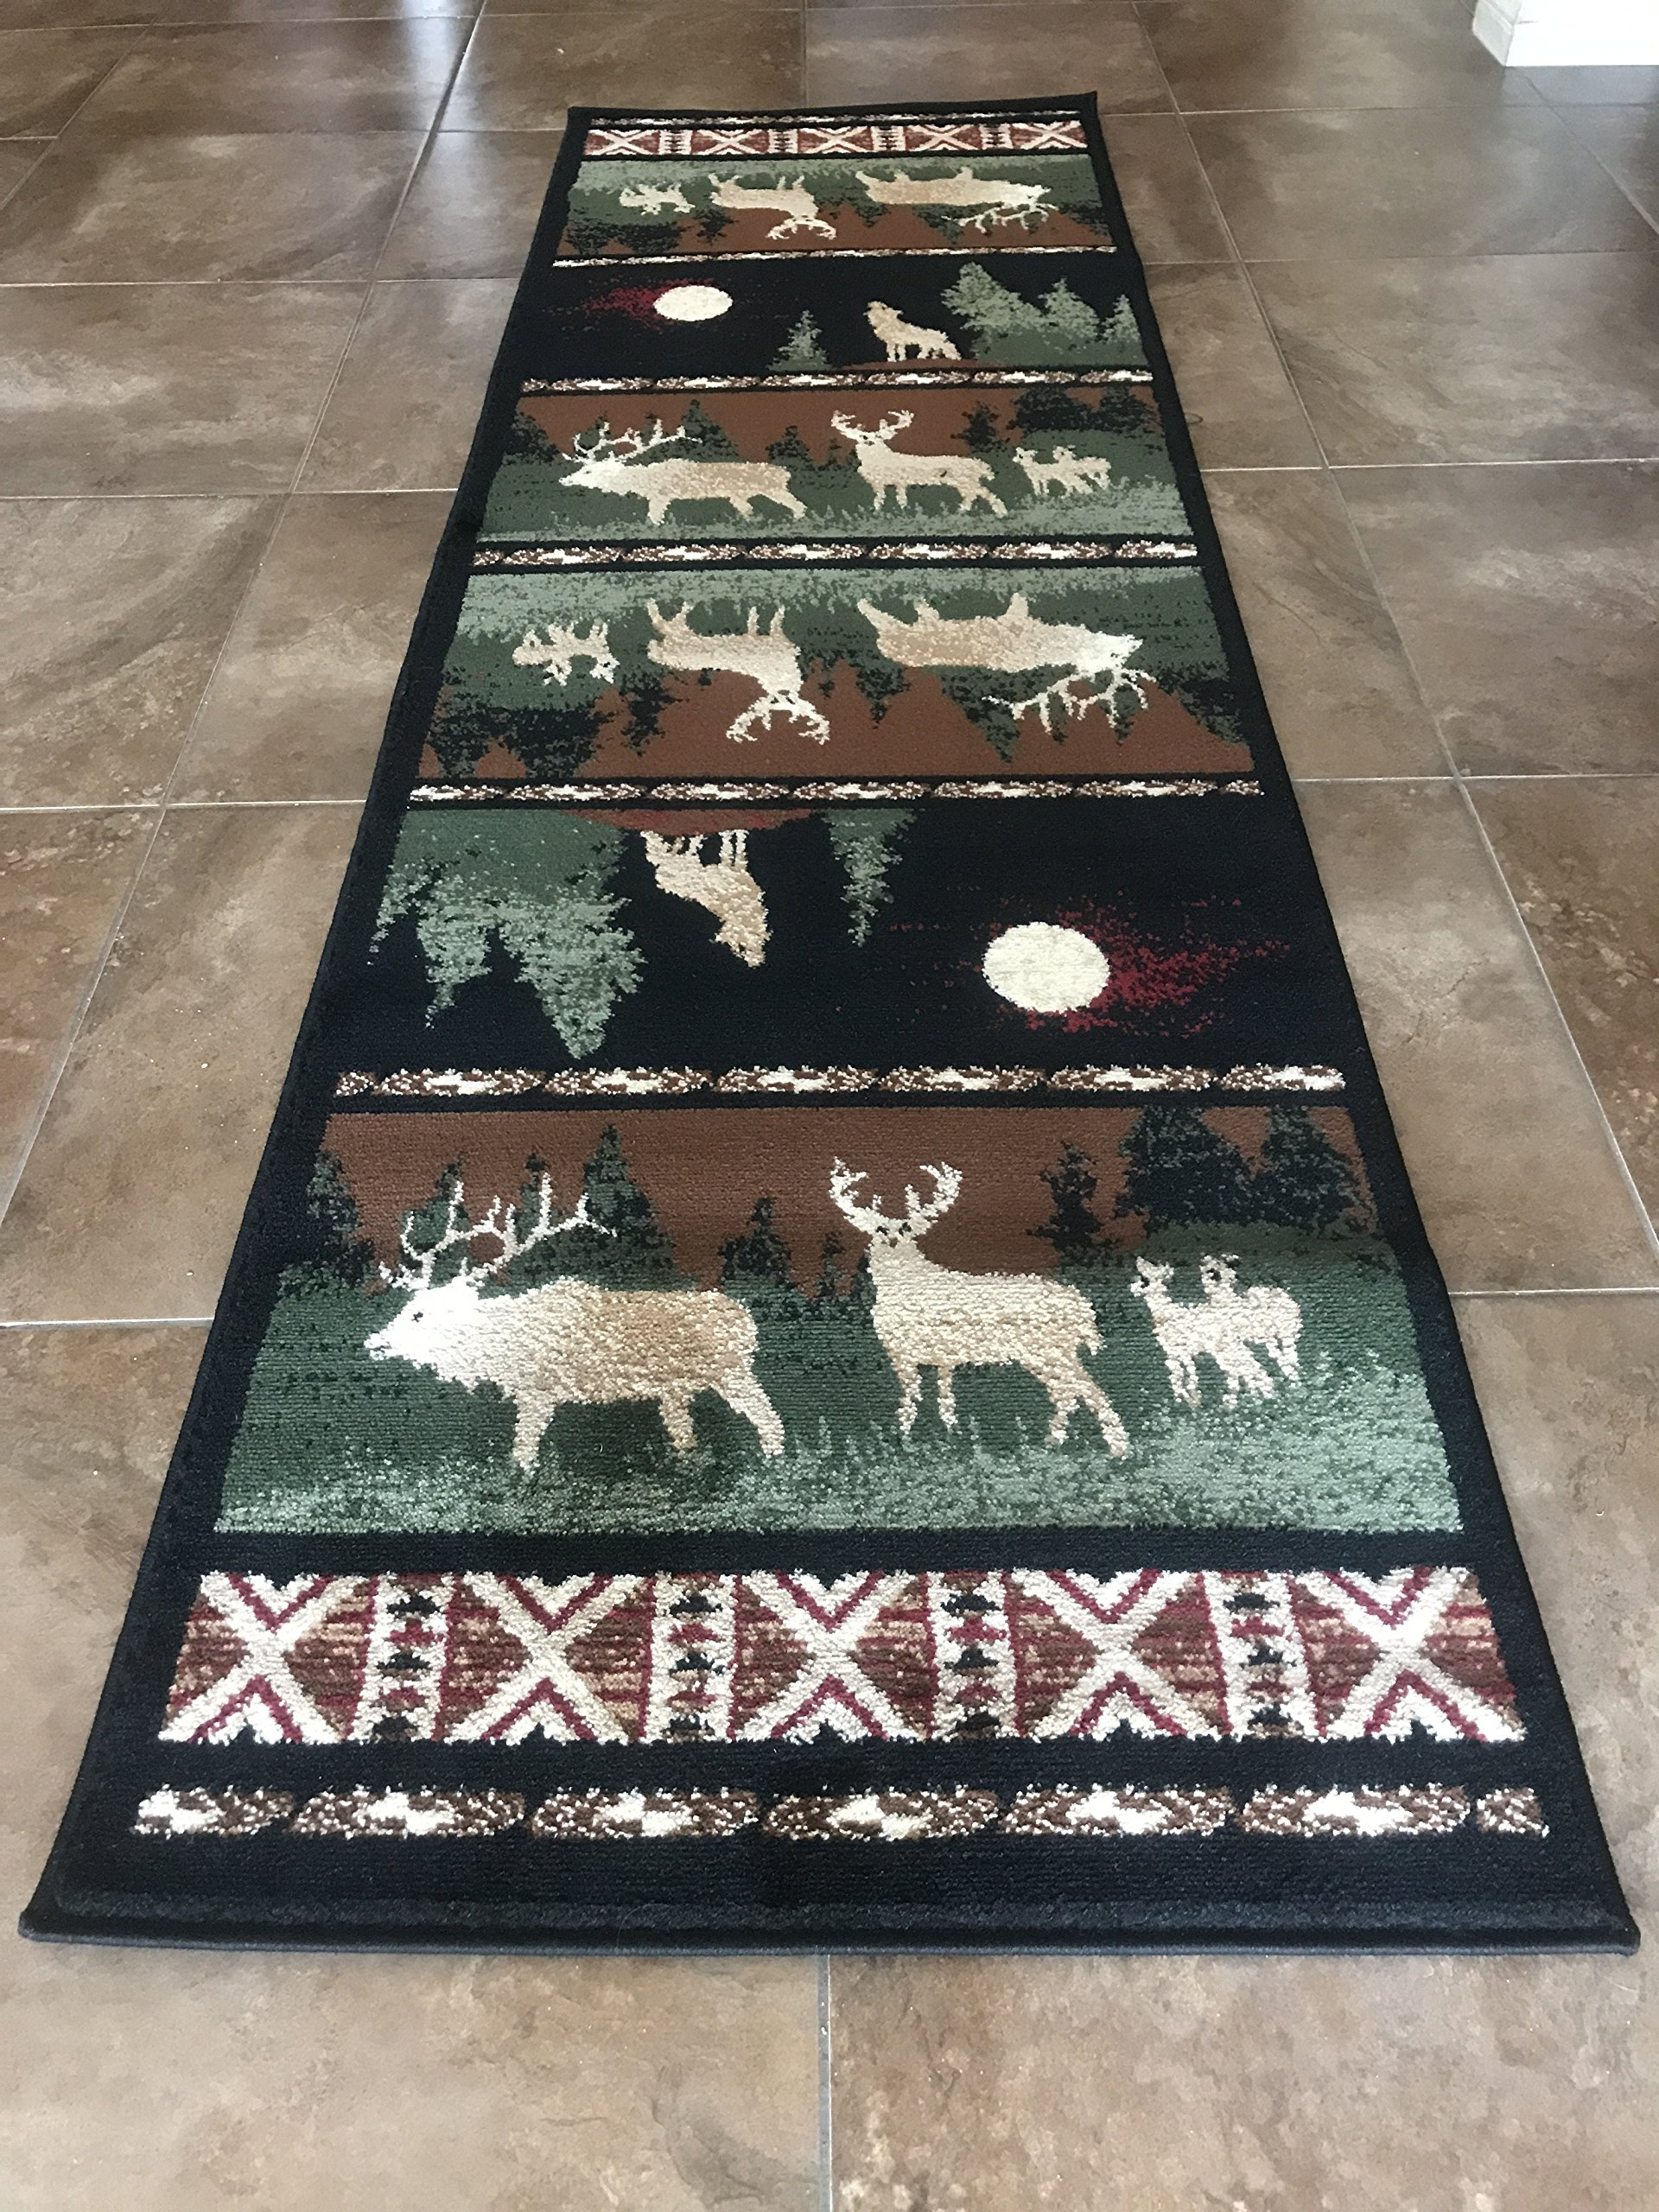 Carpet King Cabin Style Runner Area Rug Country Lodge Elk Deer Wildlife Design 382 (2 Feet 2 Inch X 7 Feet 2 Inch)